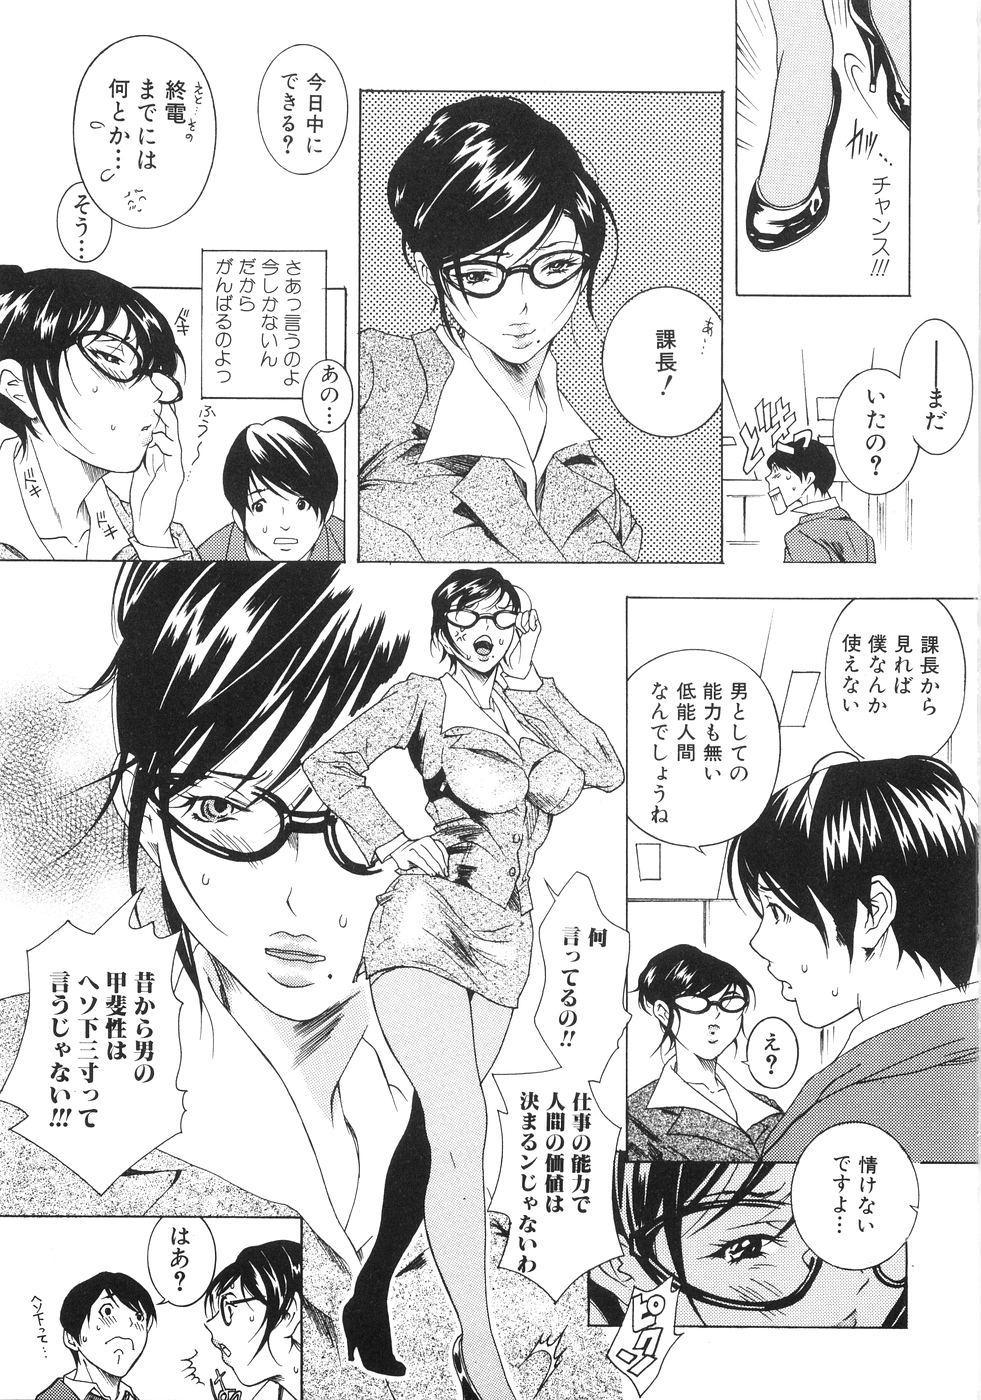 Honki Jiru - Cowper's Gland Liquid? or Love Juice?...?! 41